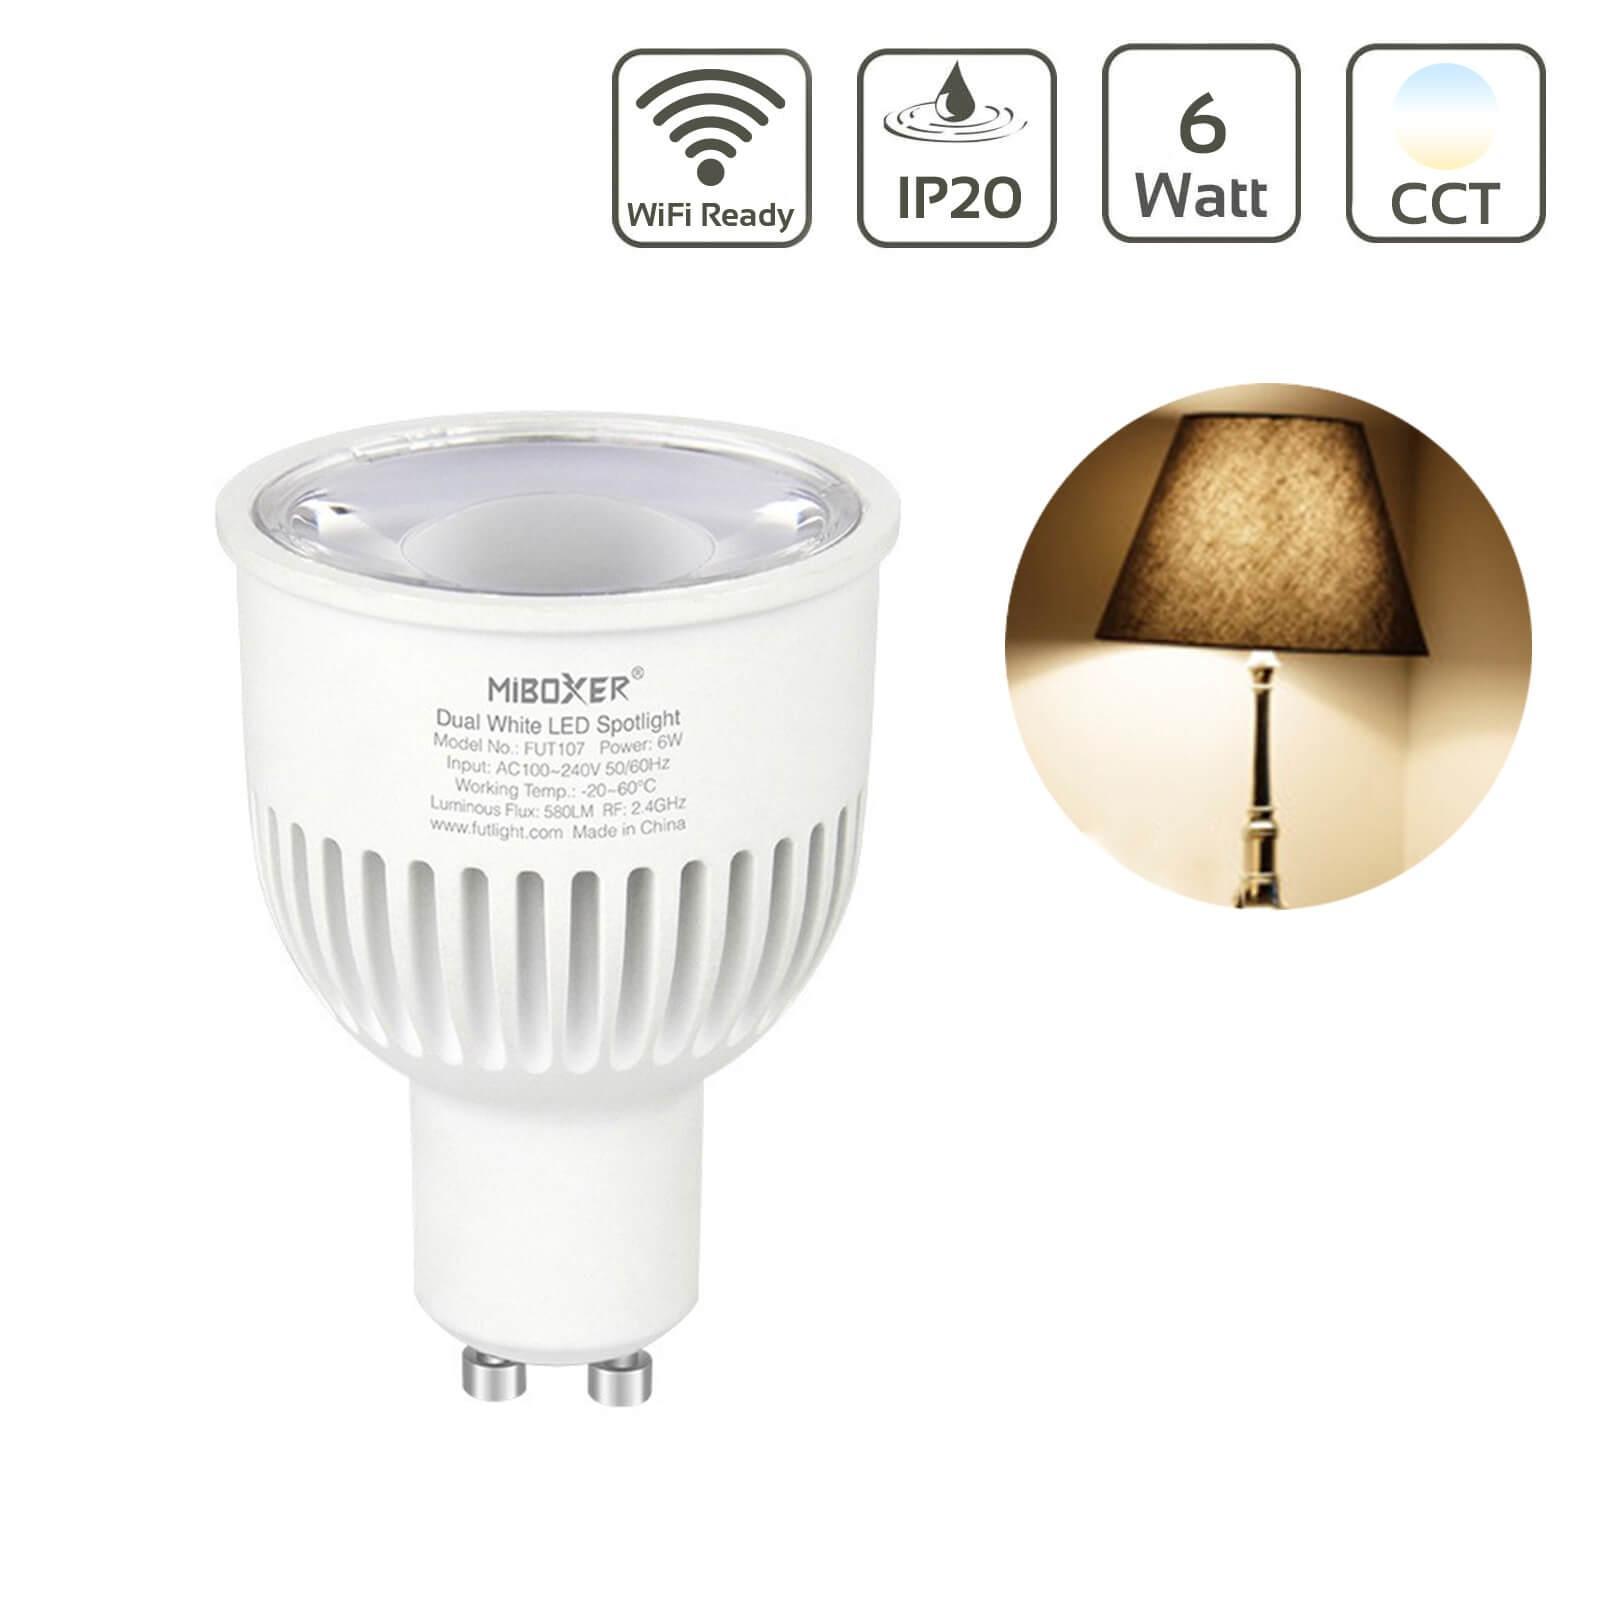 MiBoxer CCT LED Spot 6W GU10 Wifi ready FUT107